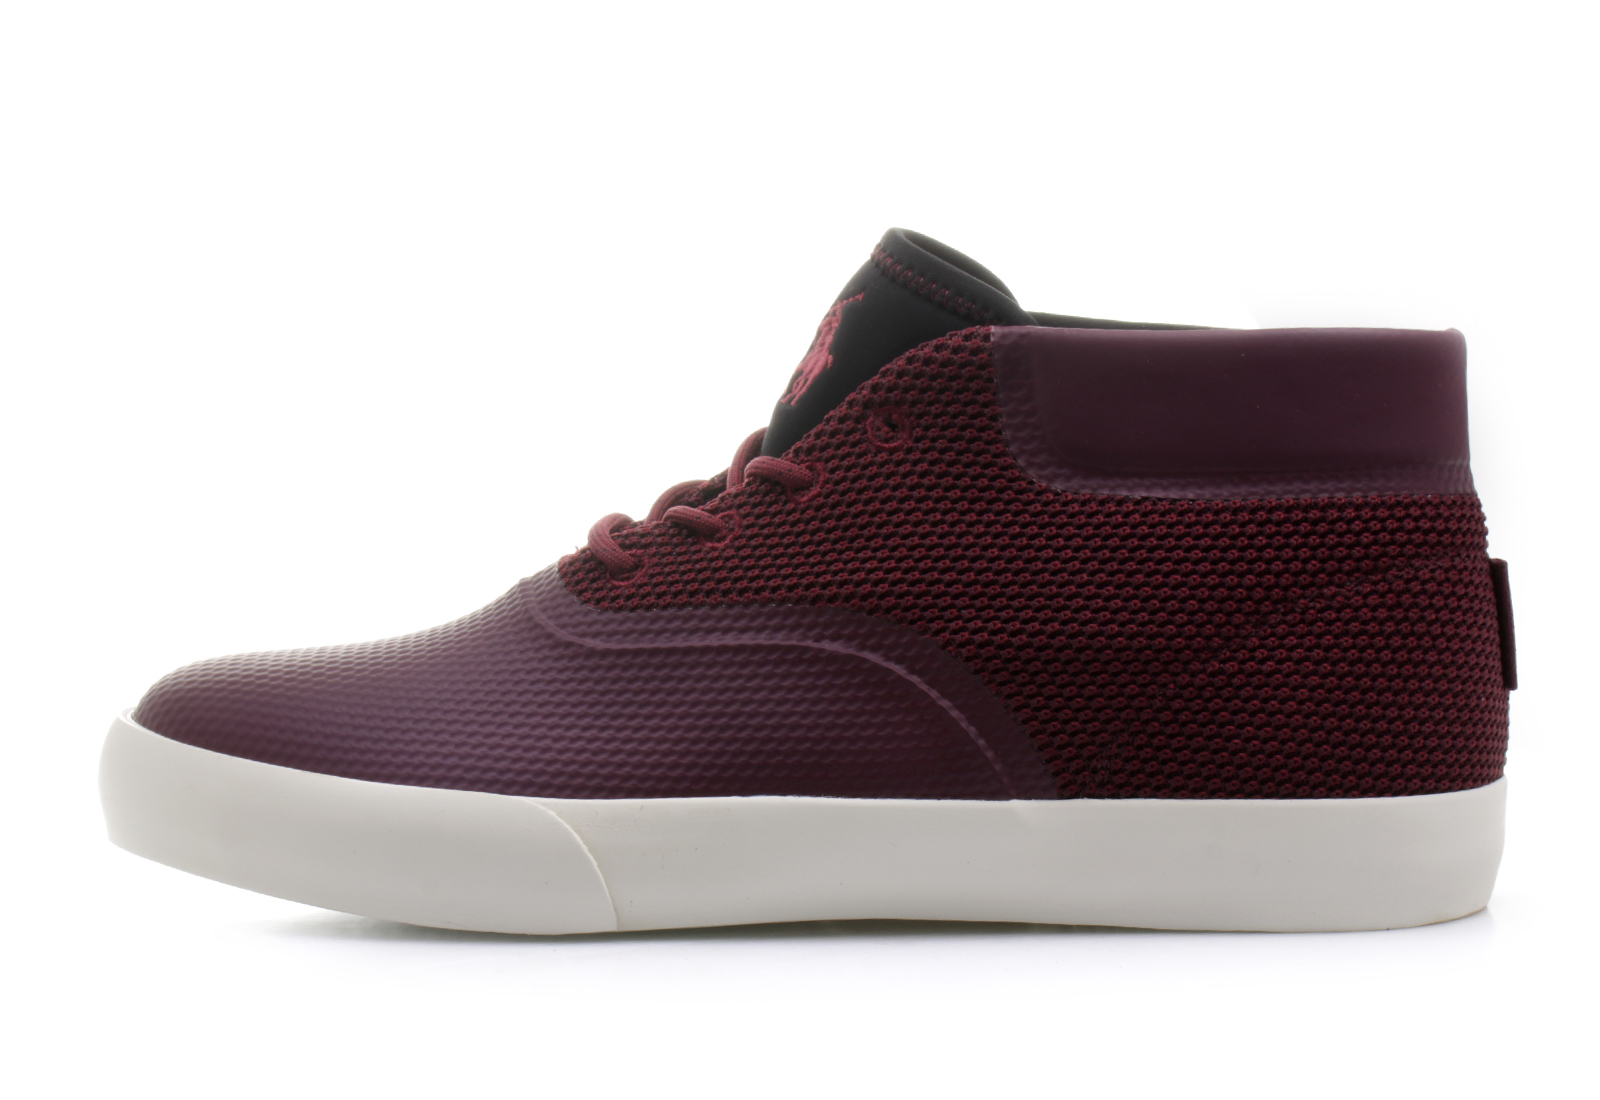 Lauren For SneakersAnd Ralph Ne Online Boots Vadik Polo Shoes 816678120005 Shop 35A4LjRq